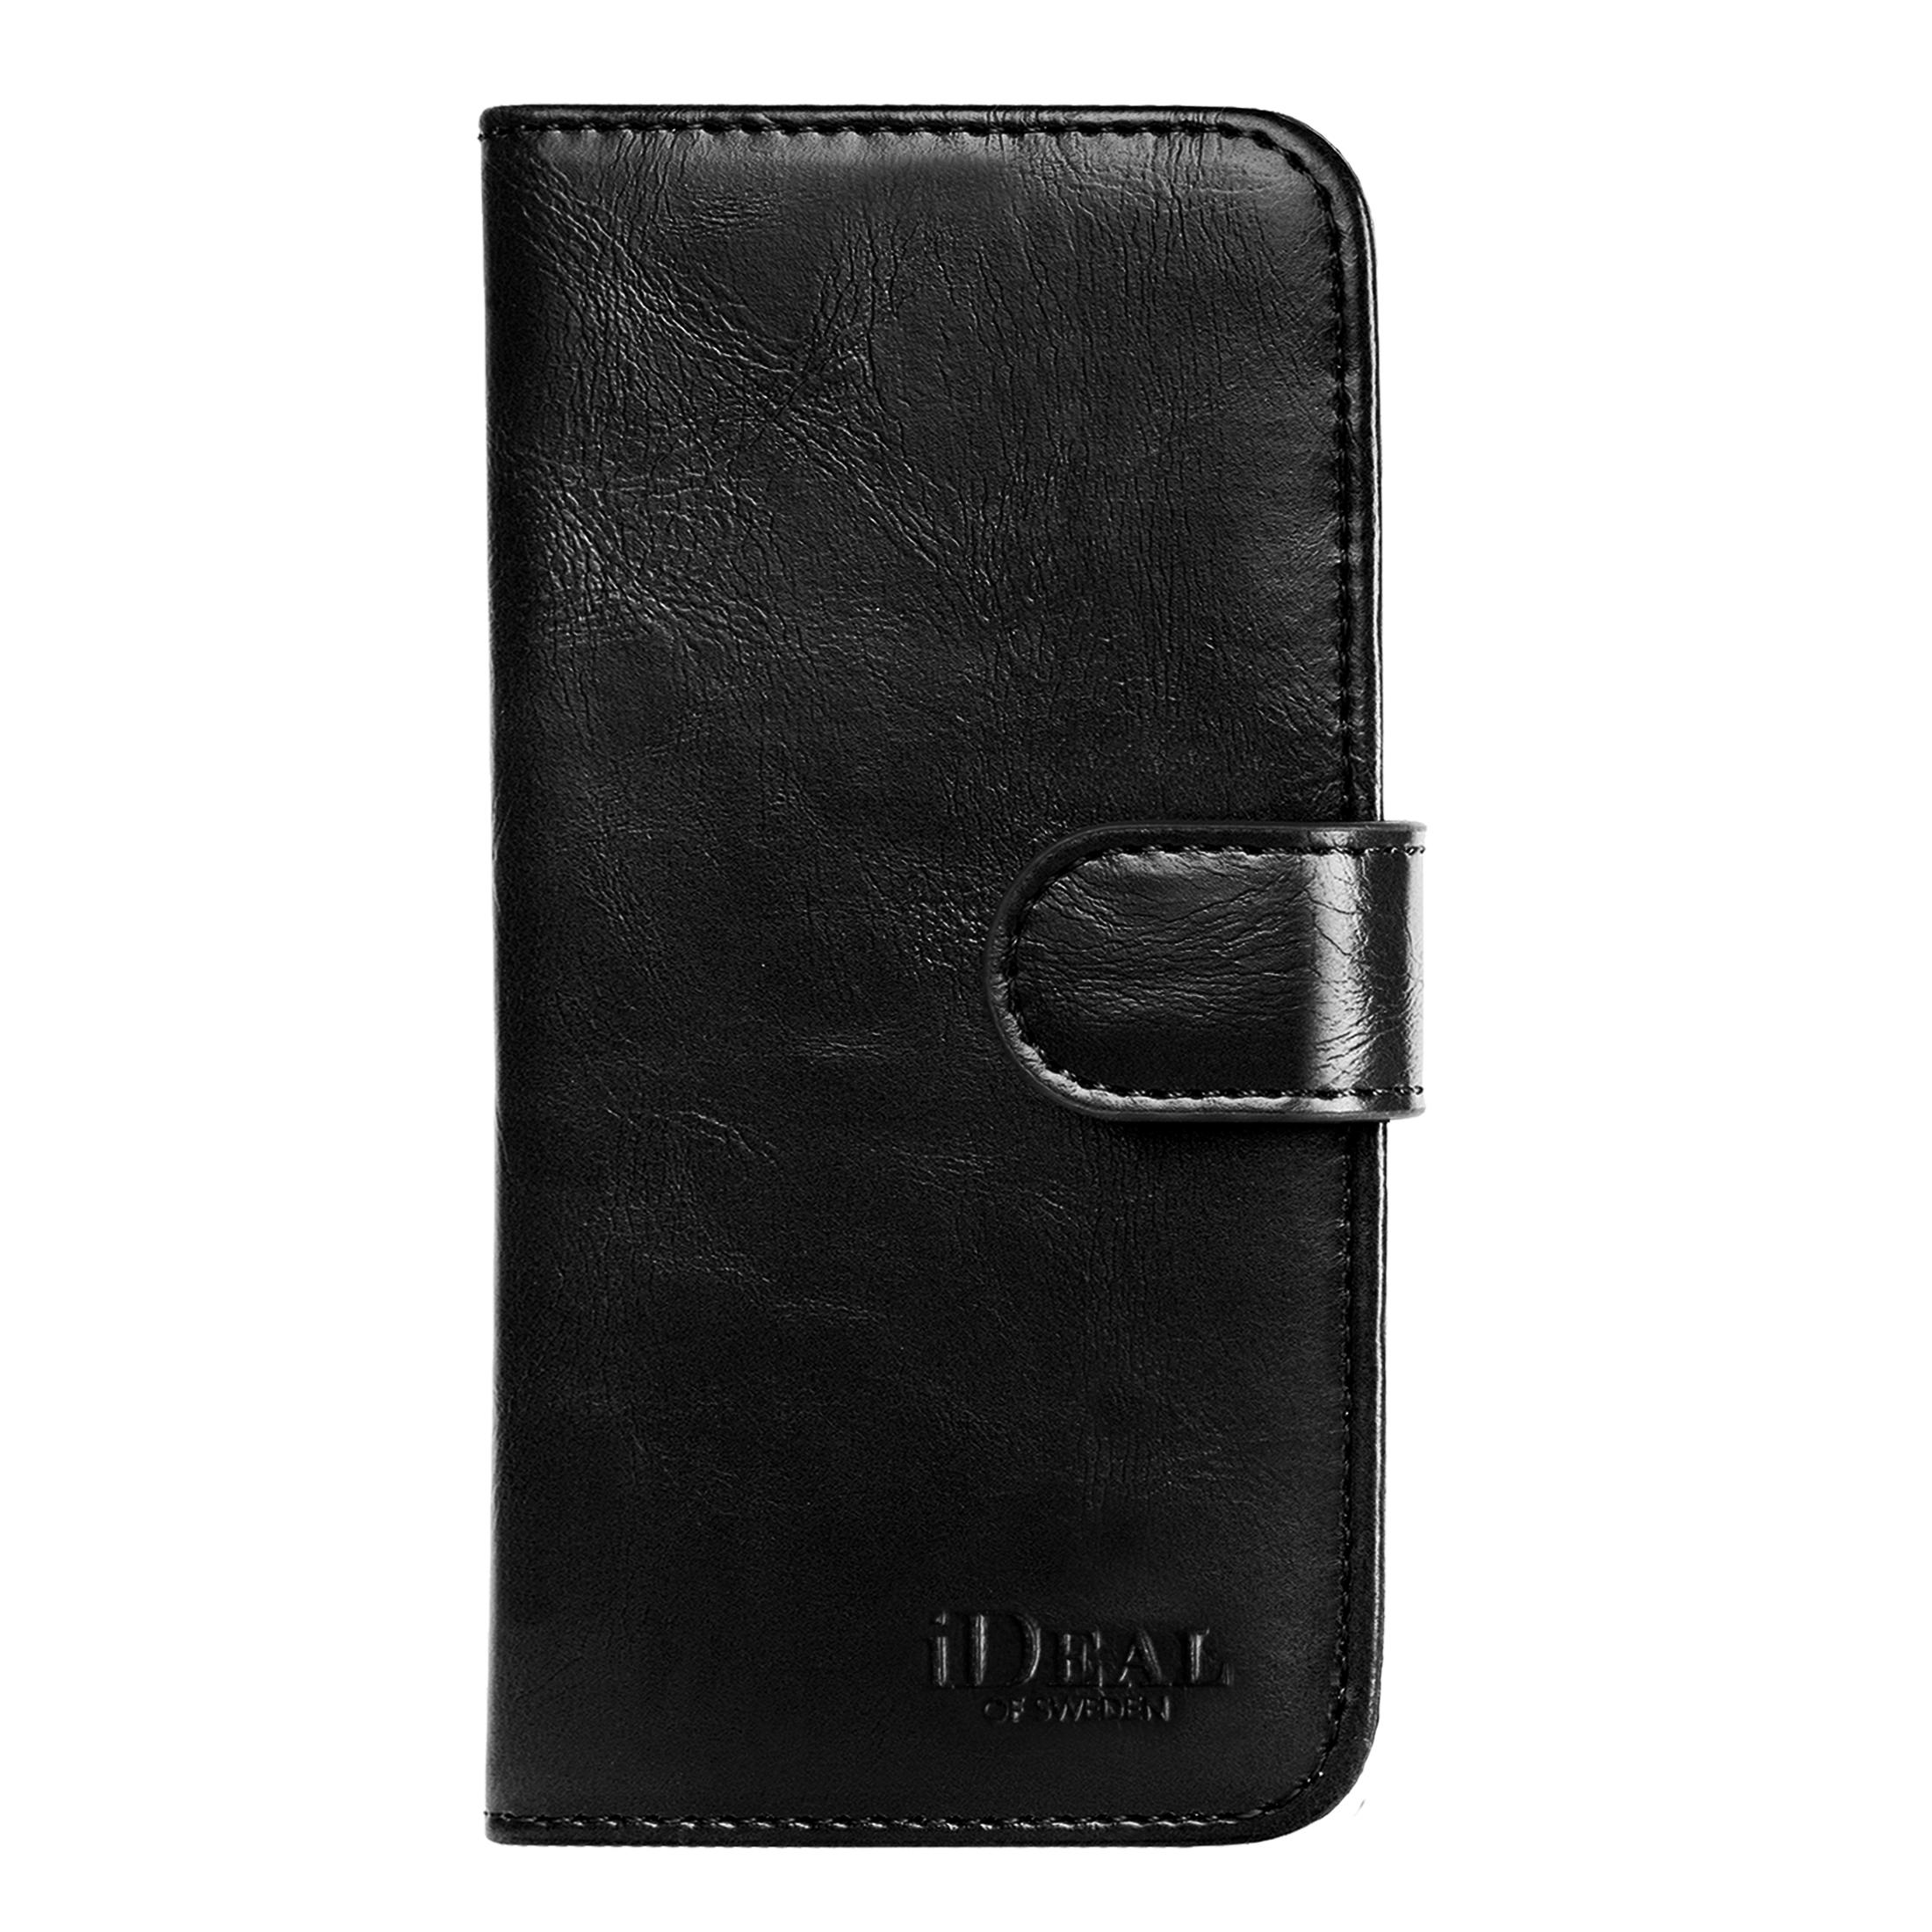 Magnet Wallet+ iPhone X/XS Black